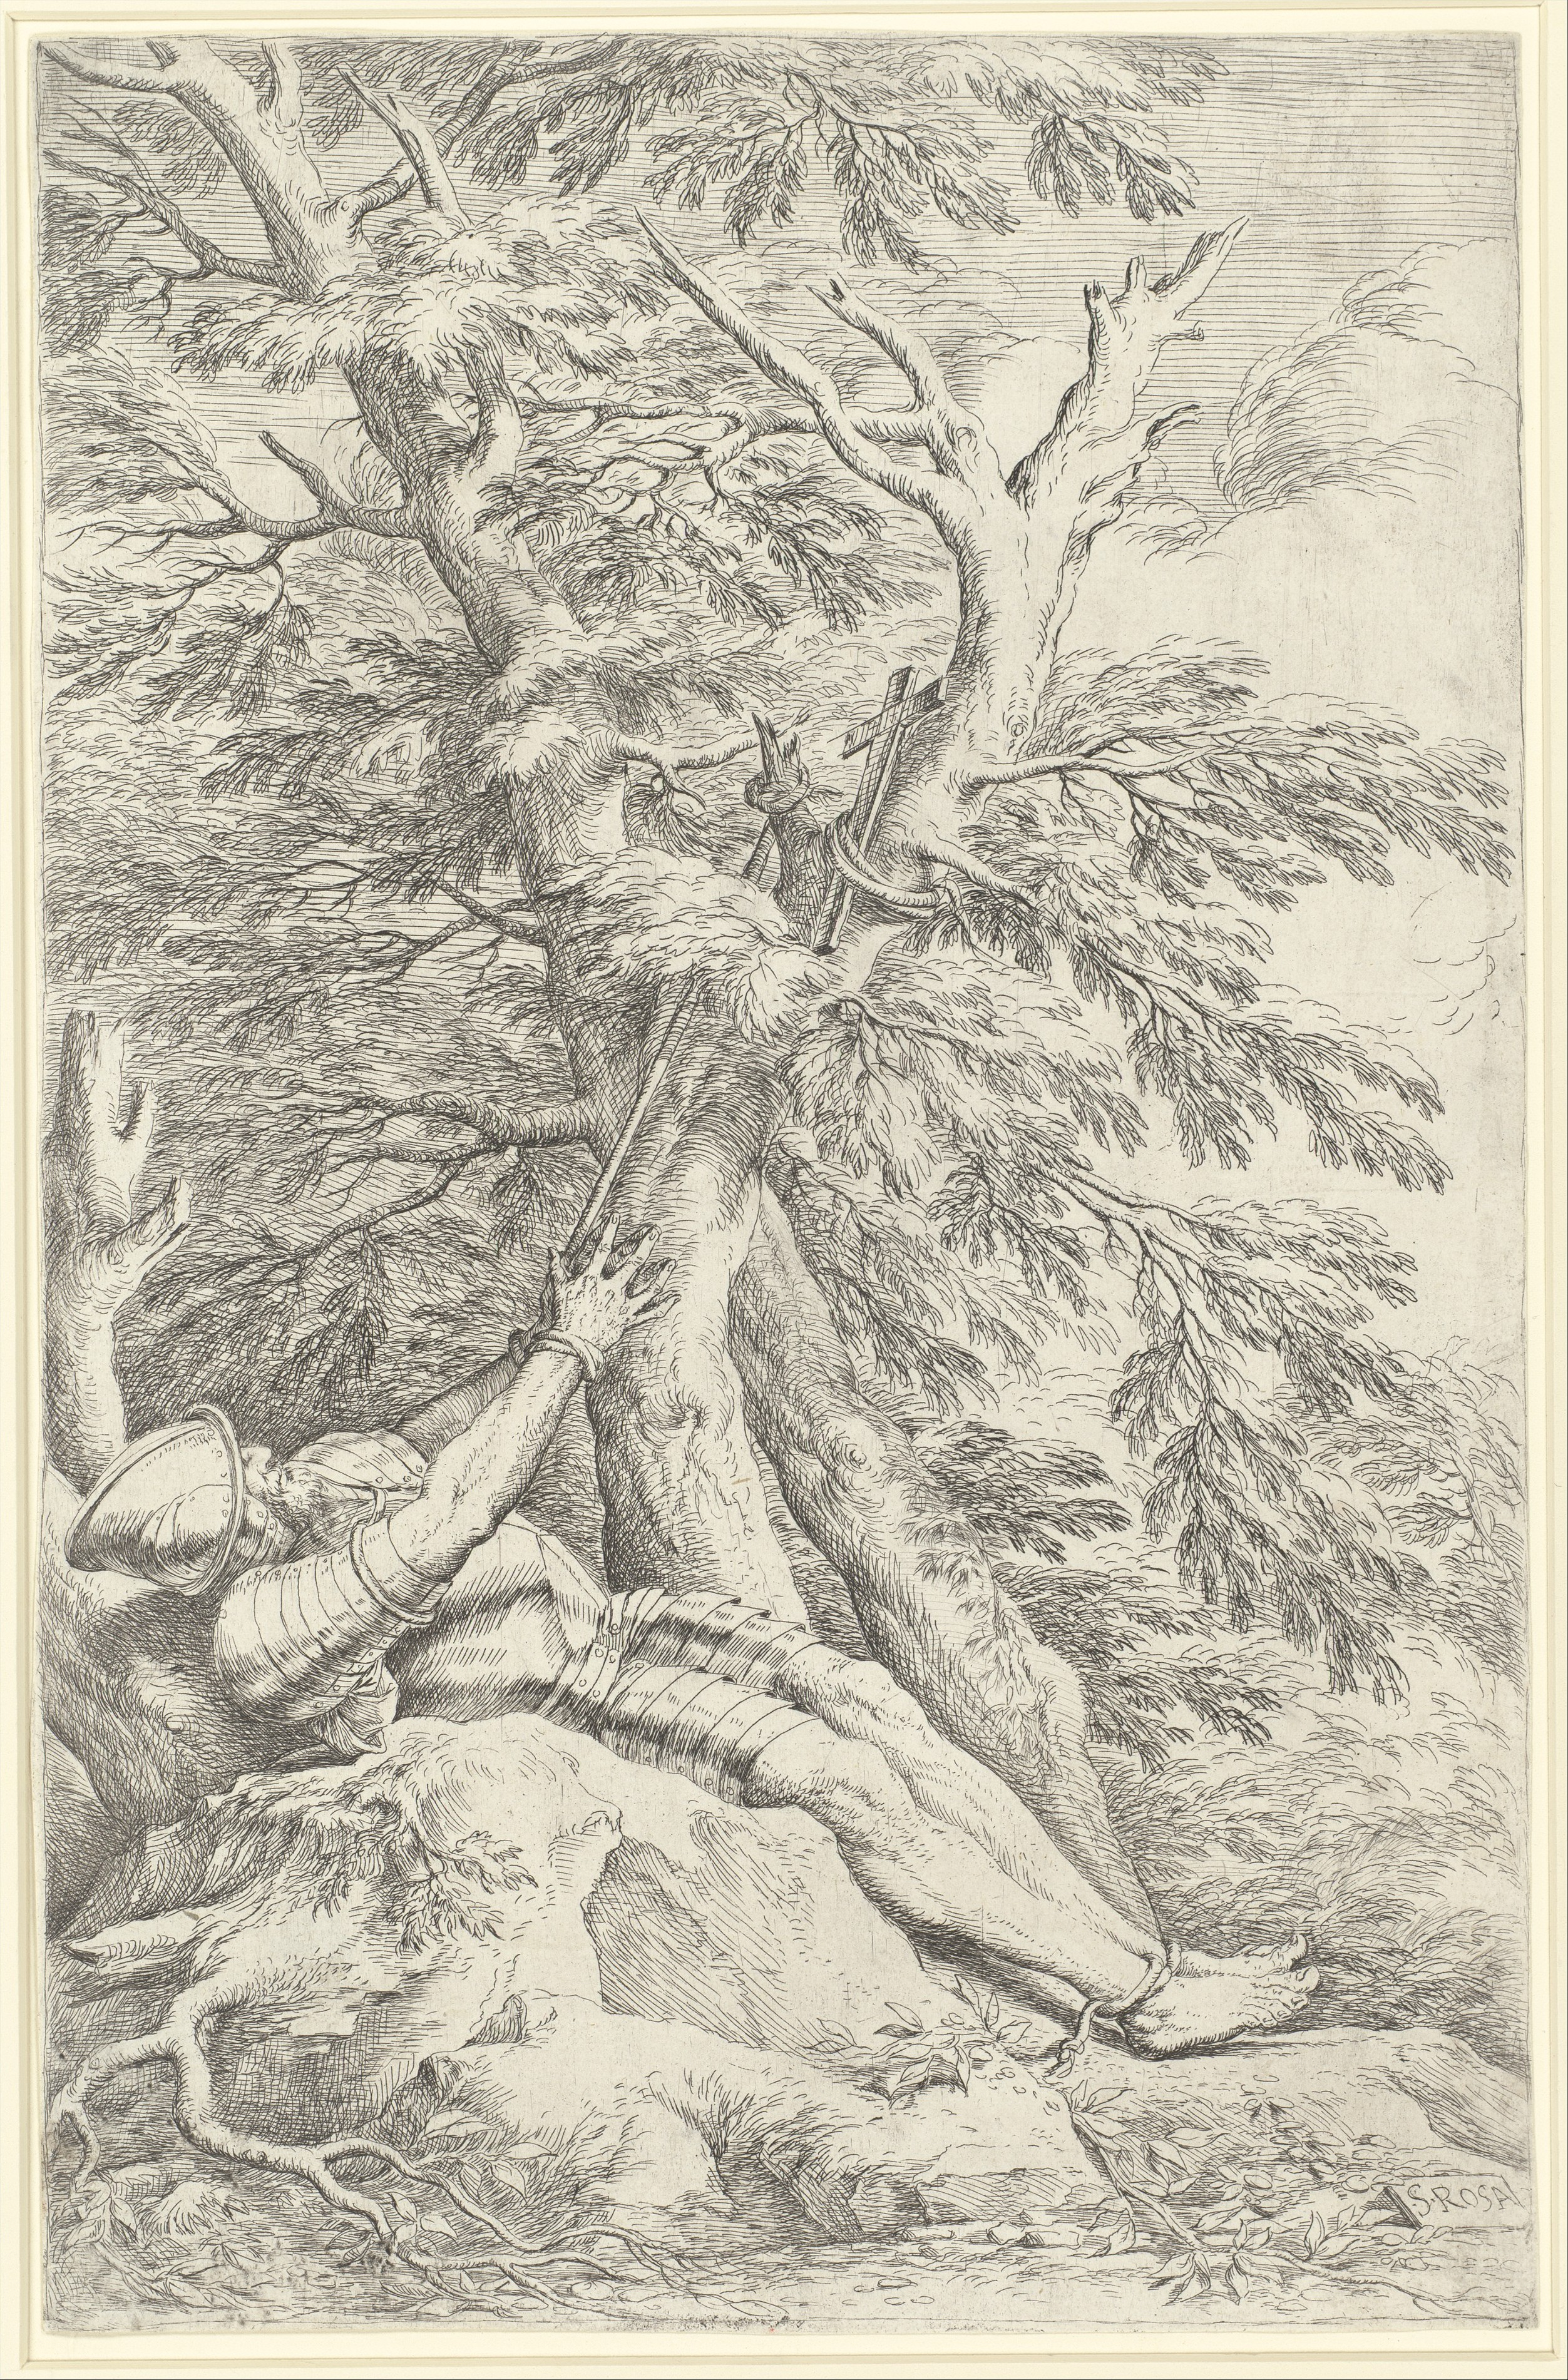 Rosa 1661 Saint Guillaume de Maleval gravure MET